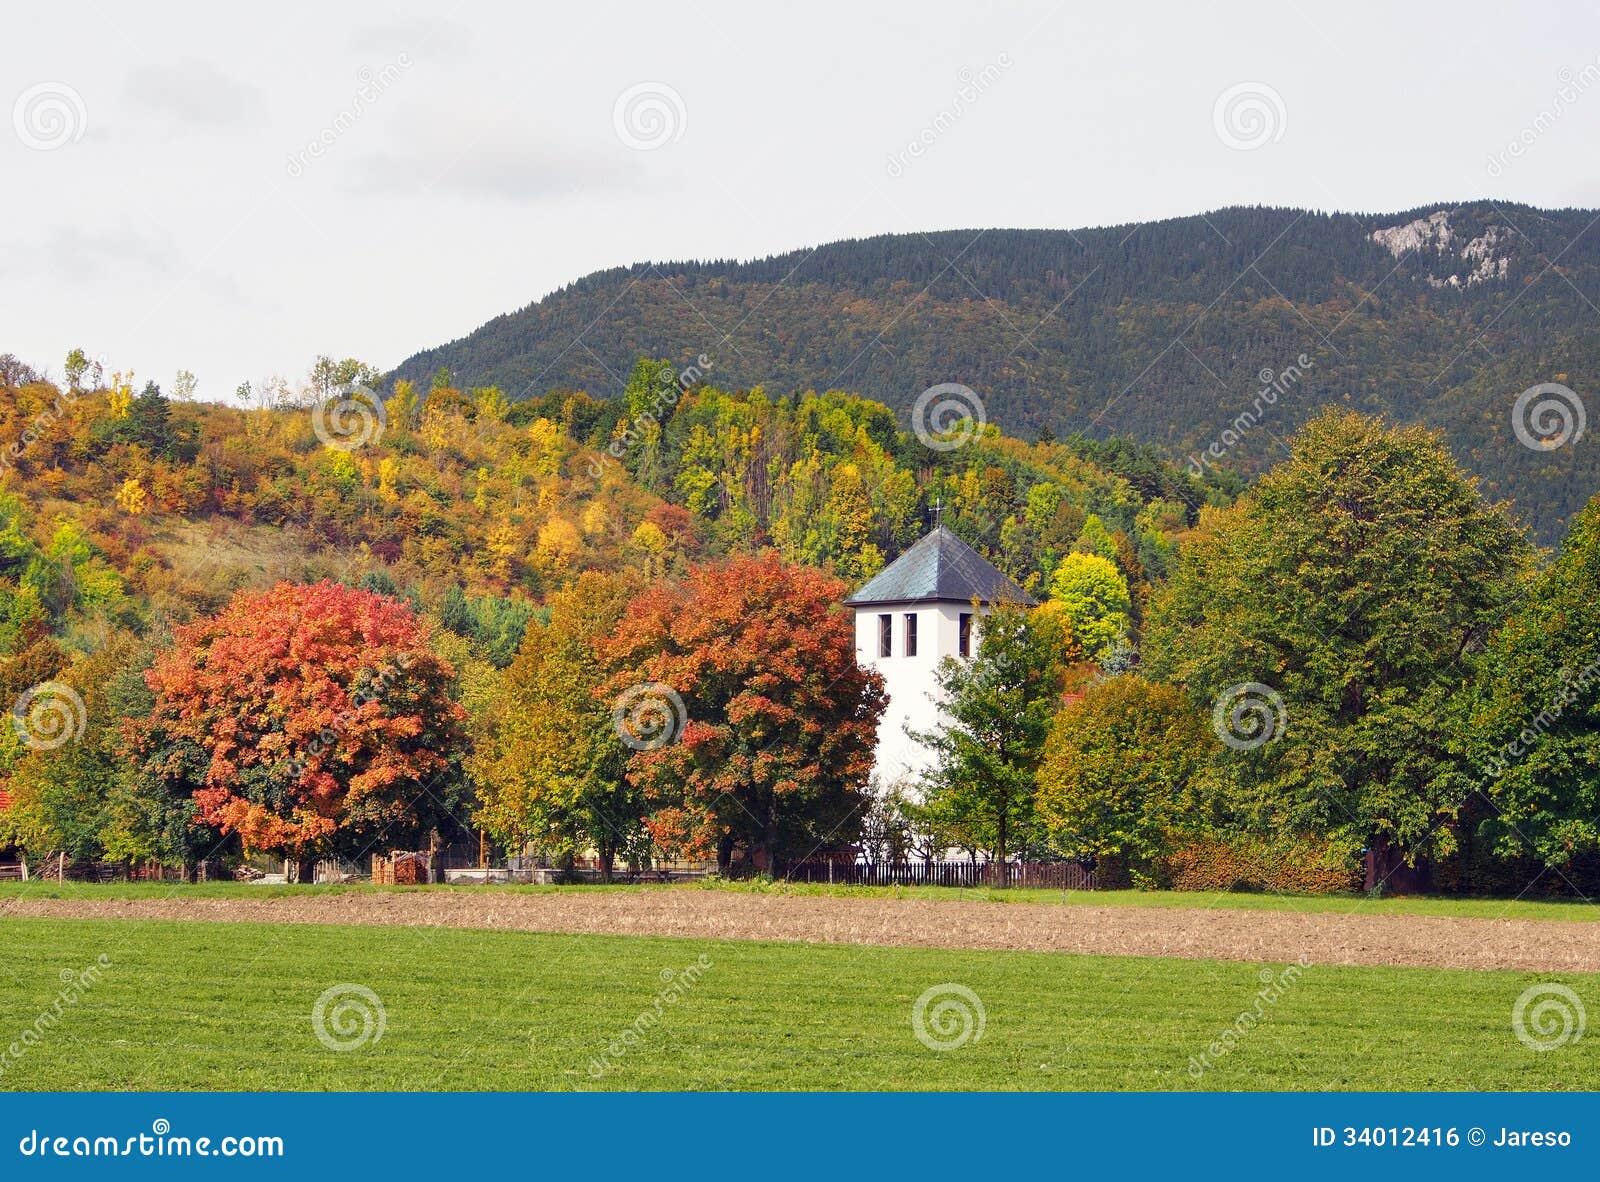 Fields and church in Liptovska Sielnica